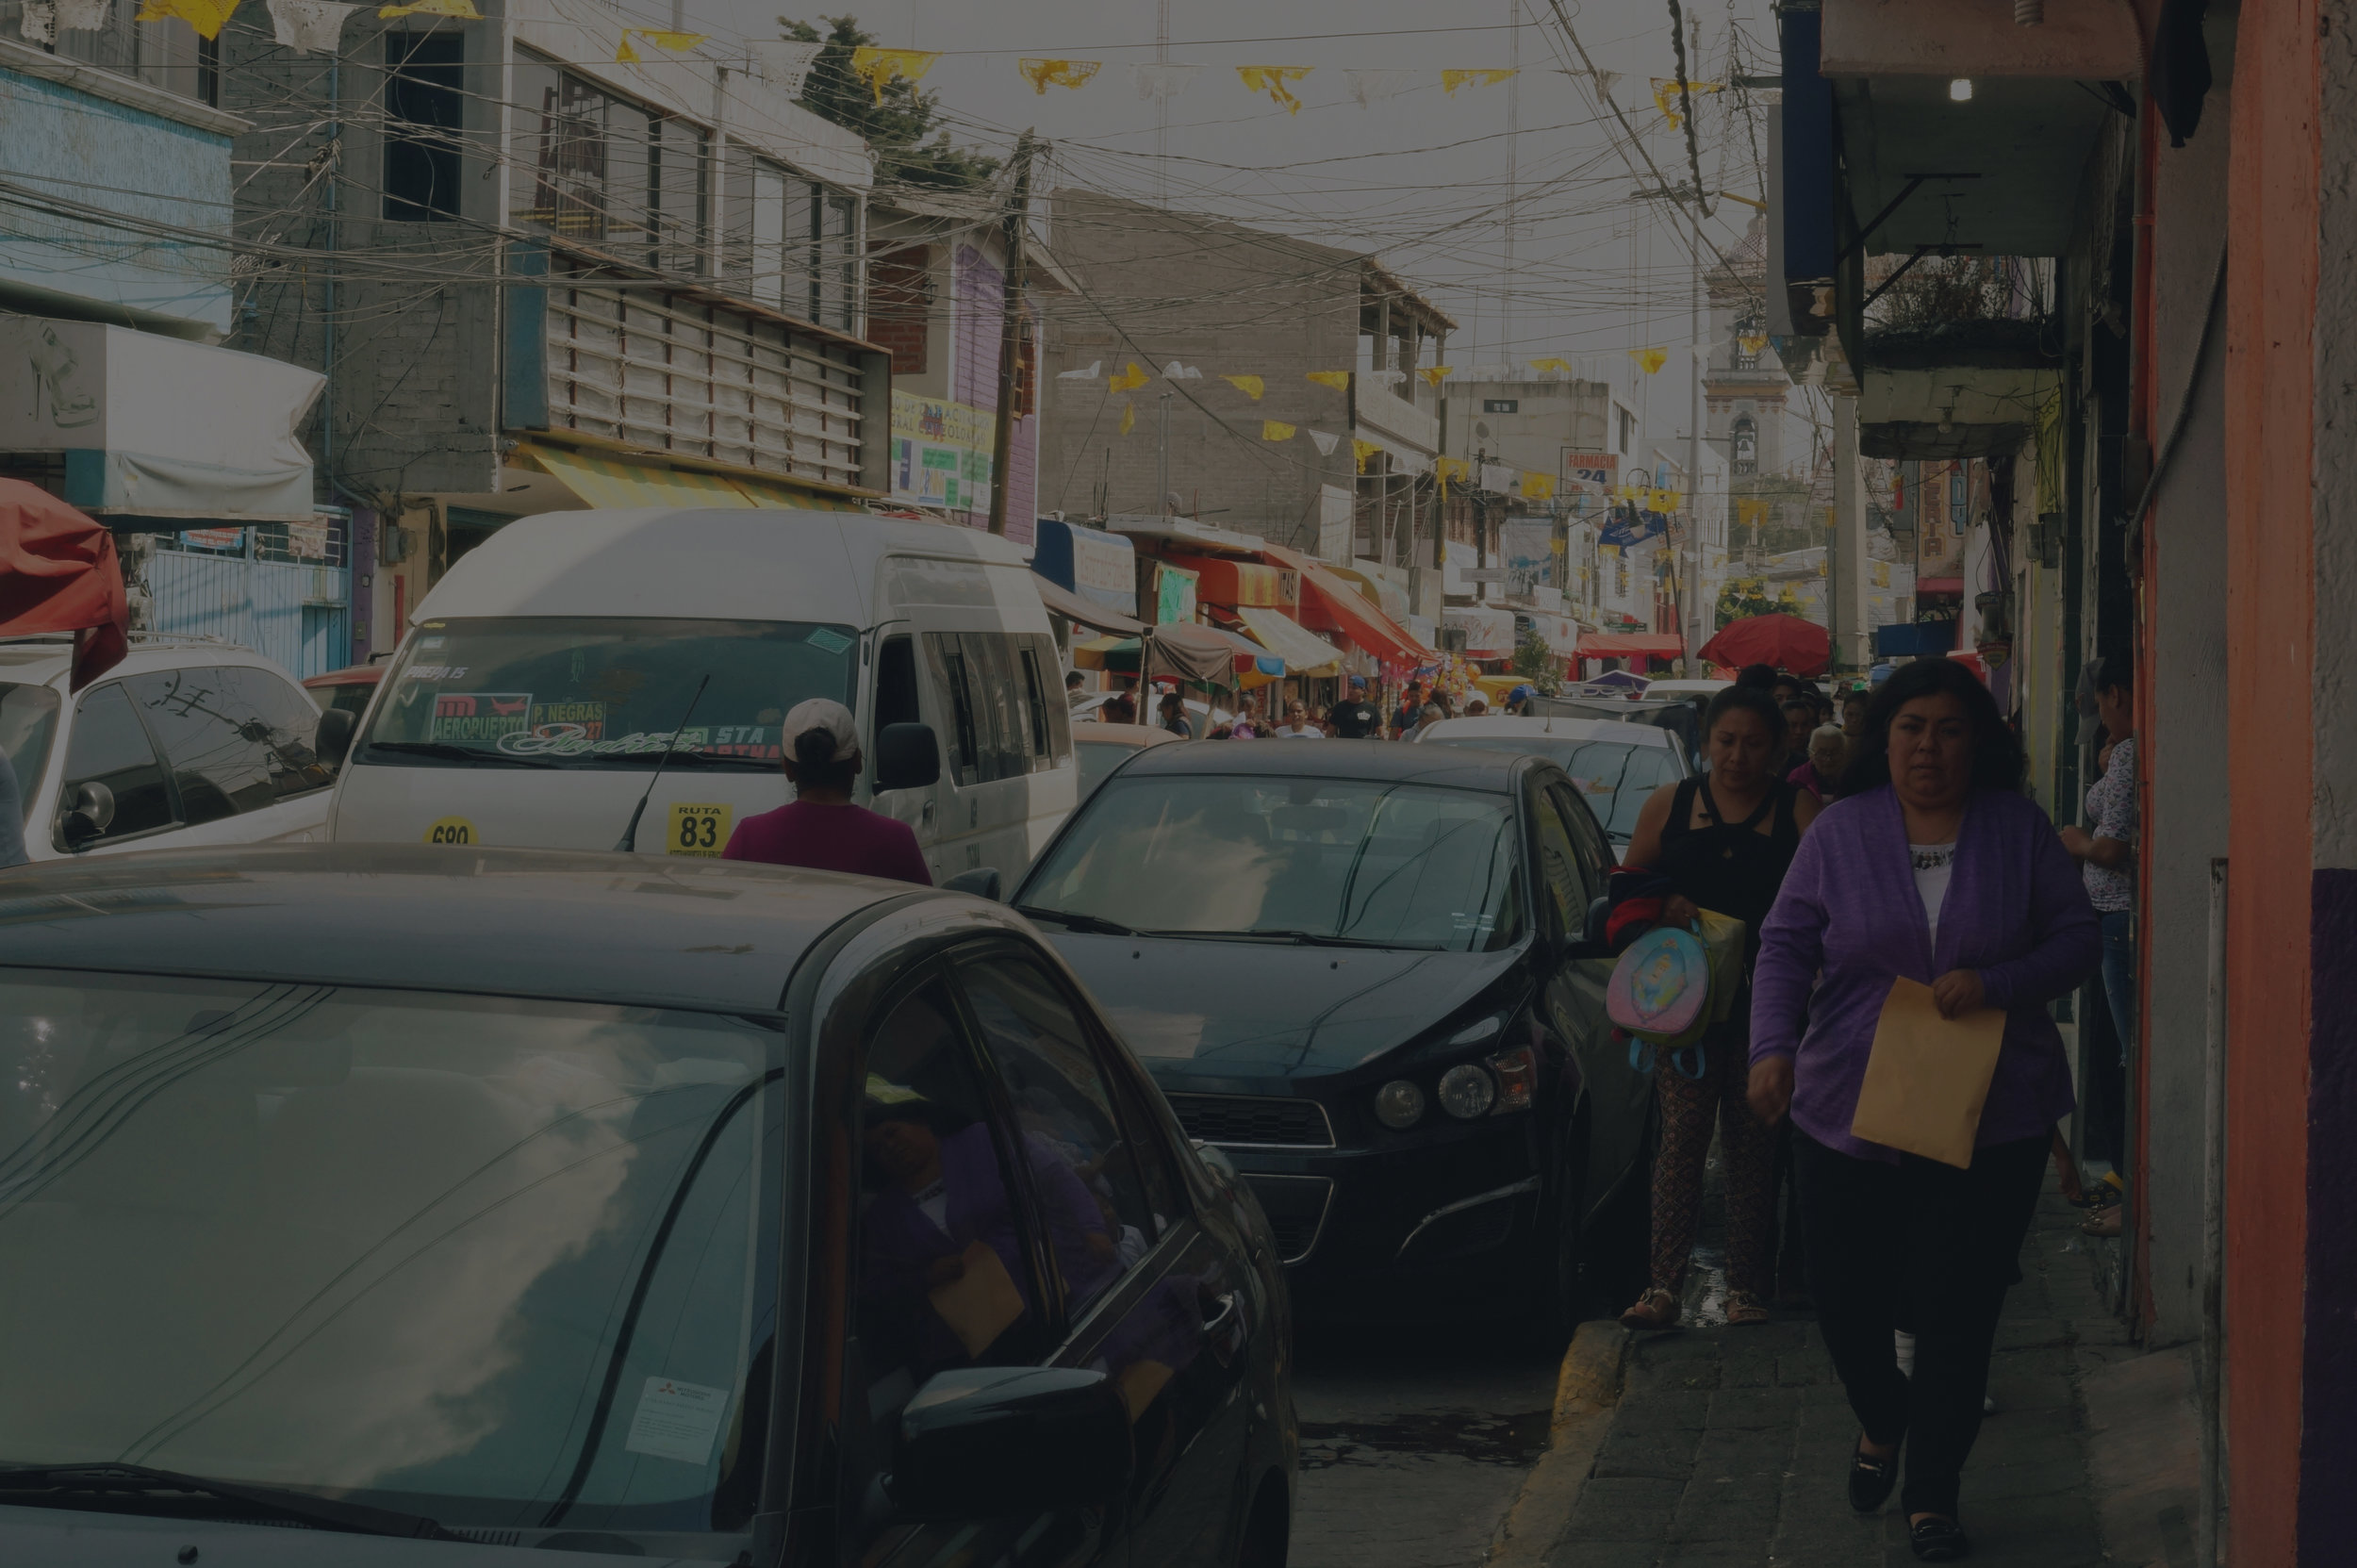 MEXICO CITY, MEXICO -